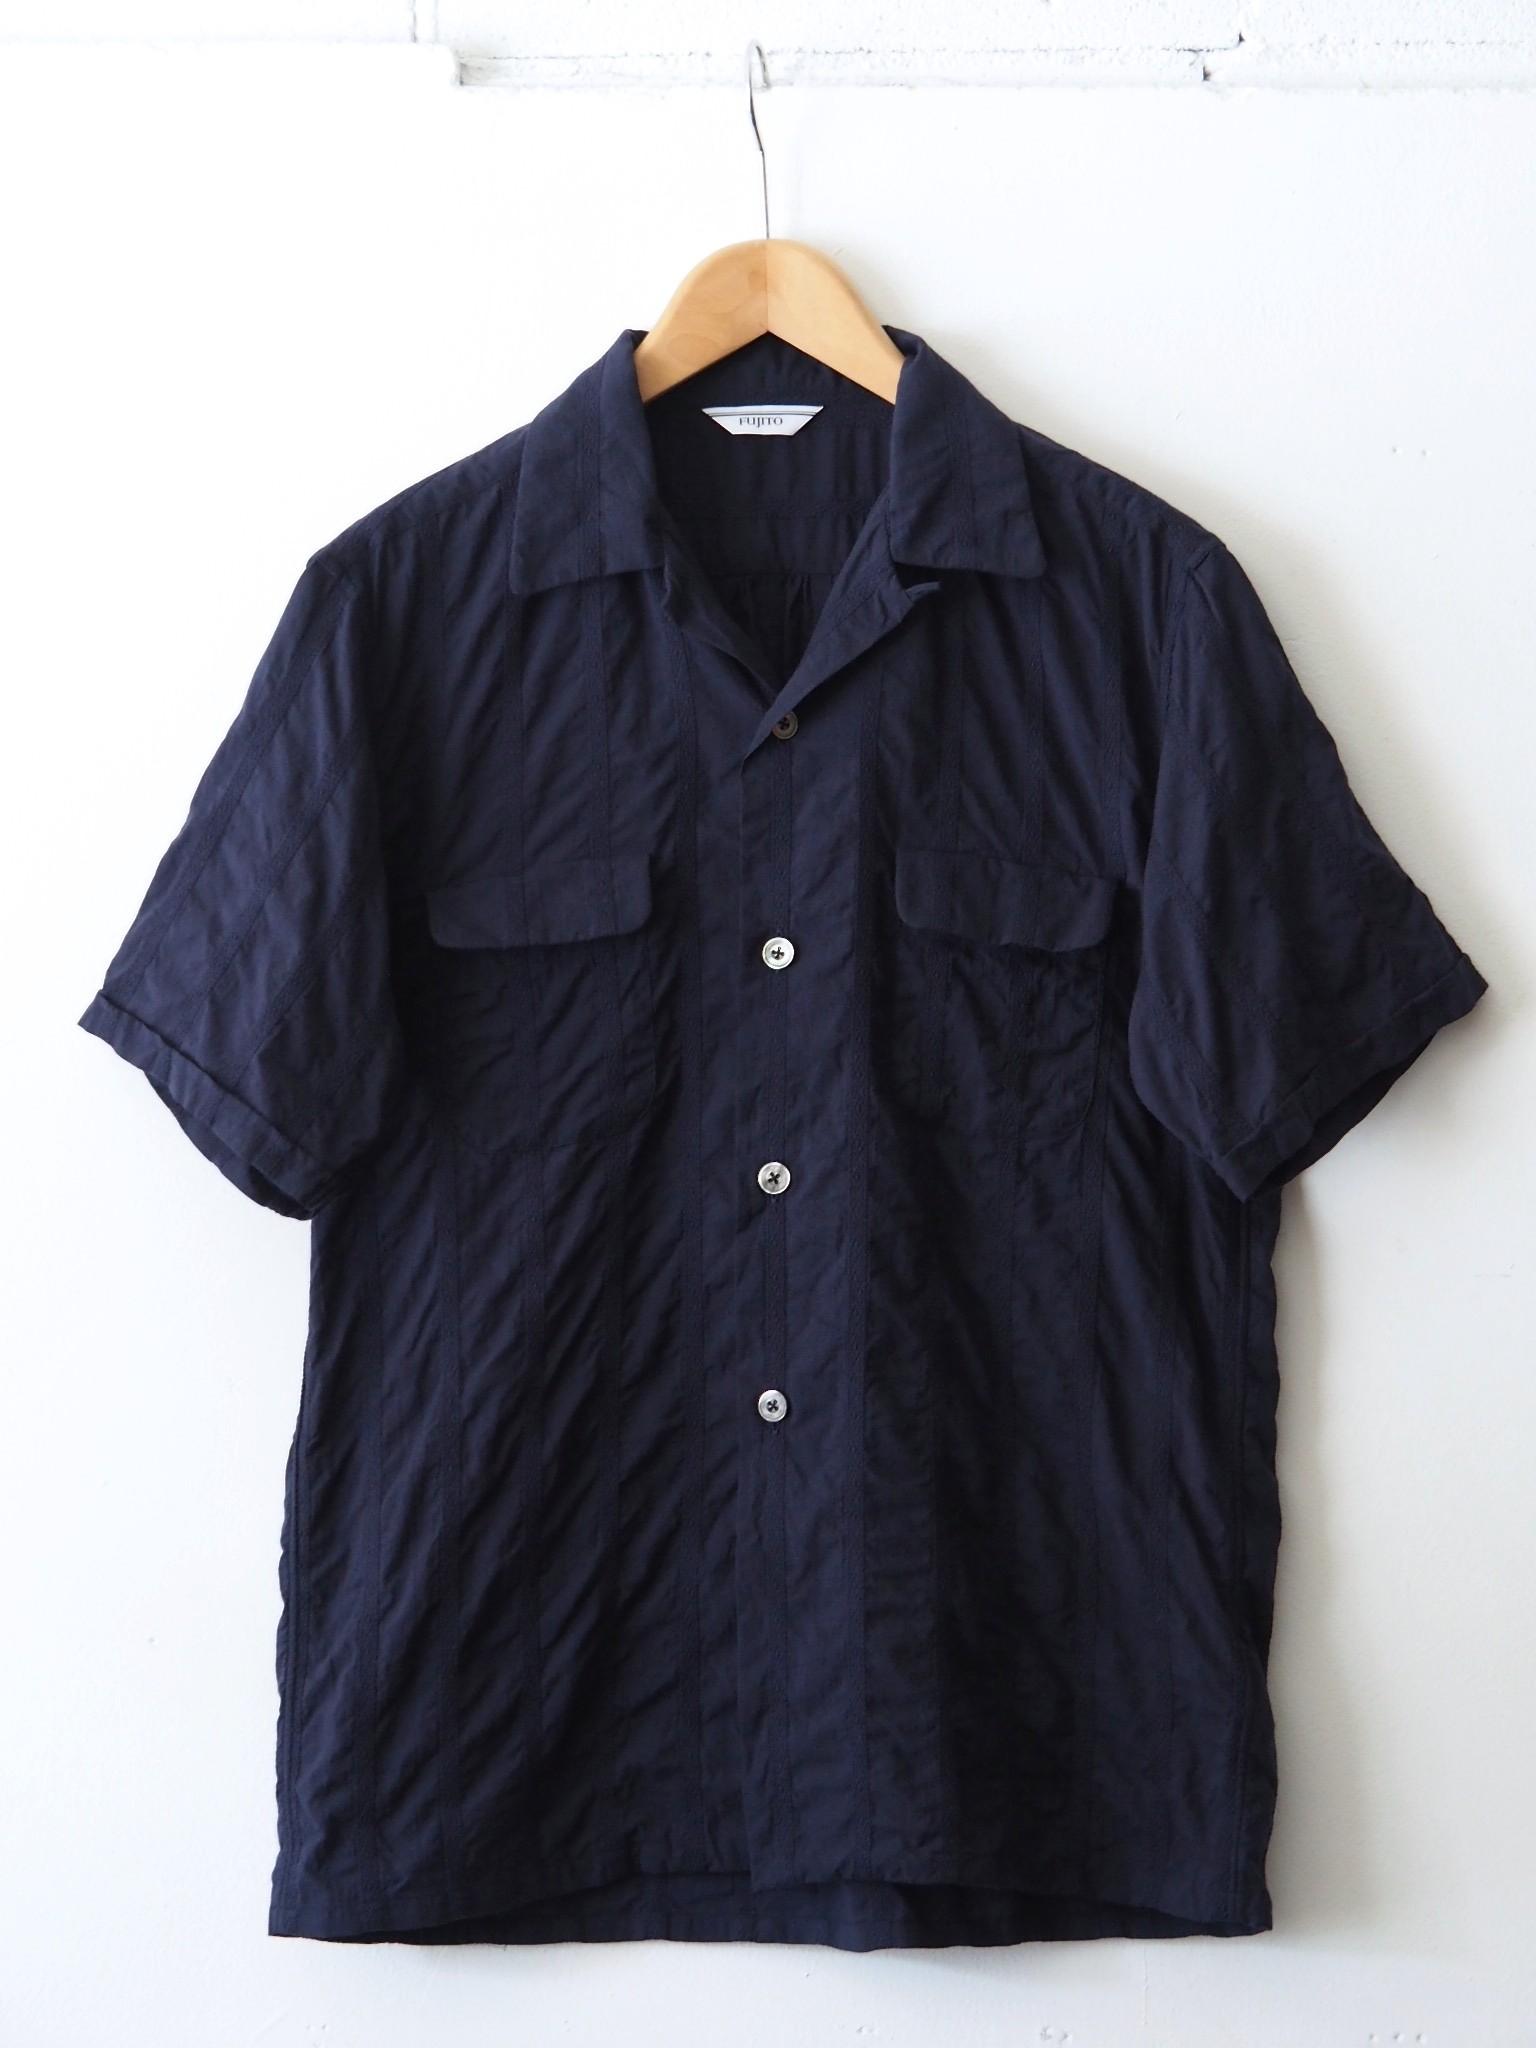 FUJITO H/S Open Collar Shirt 'Directors限定'のご紹介です